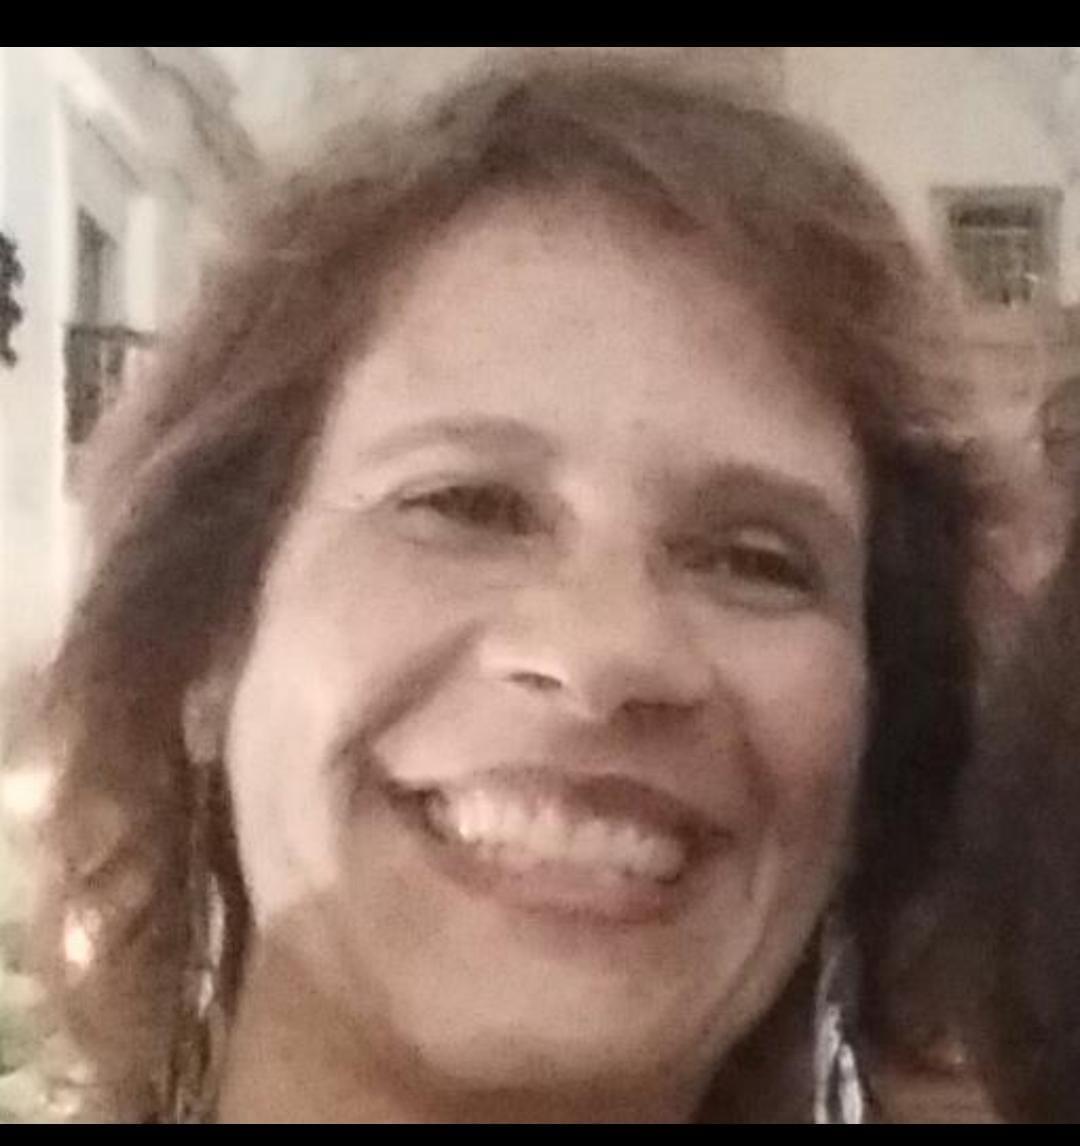 Tania Machado Knaack de Souza